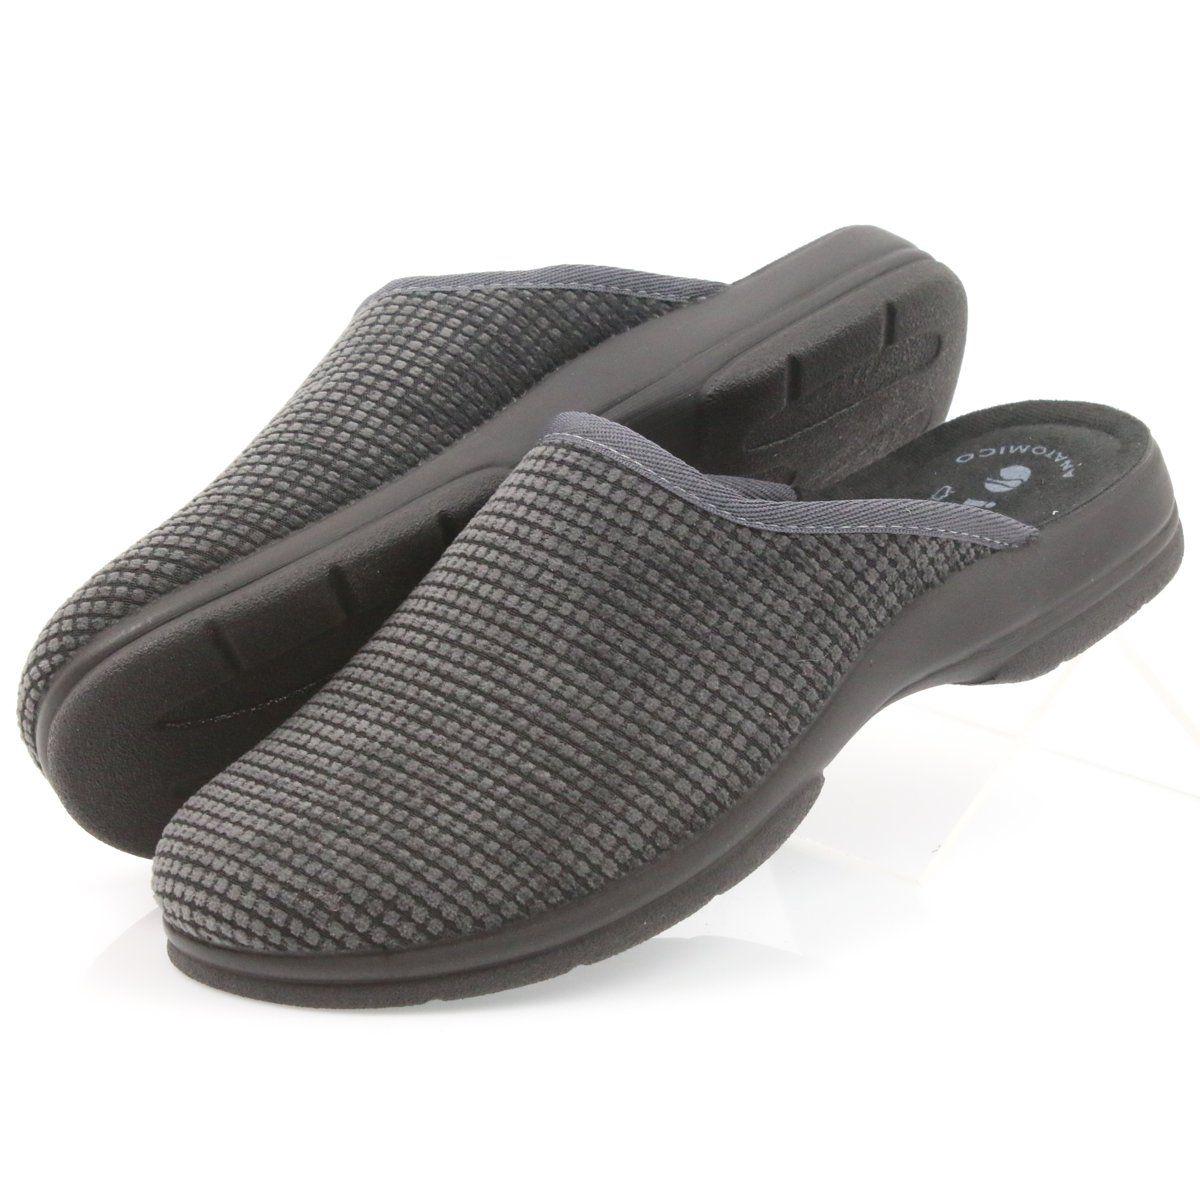 Inblu Kapcie Meskie Klapki Szare Slip On Sneaker Shoes Slip On